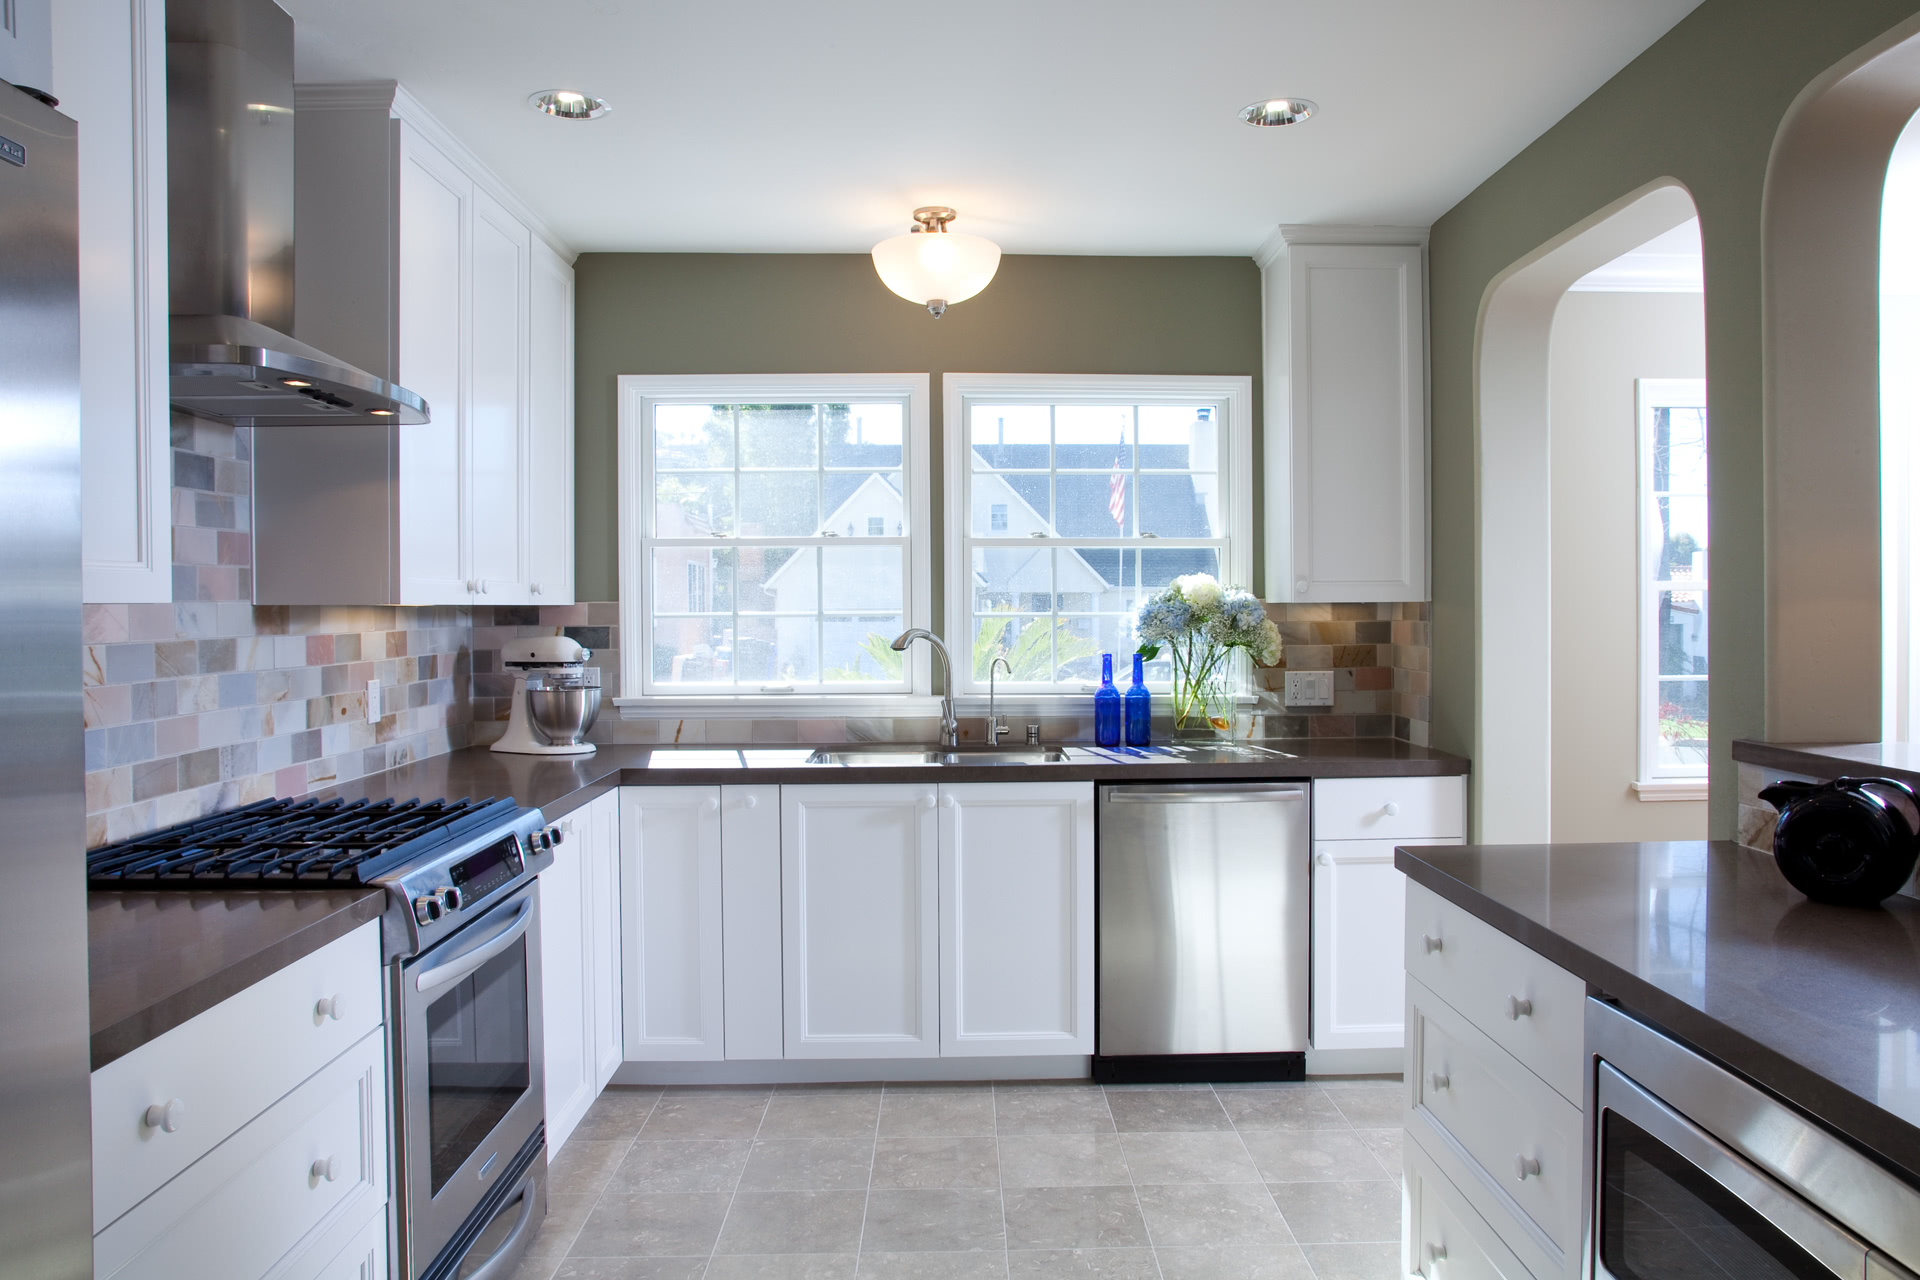 Custom Contemporary Kitchen Cabinets - Alder Wood Java Finish Shaker